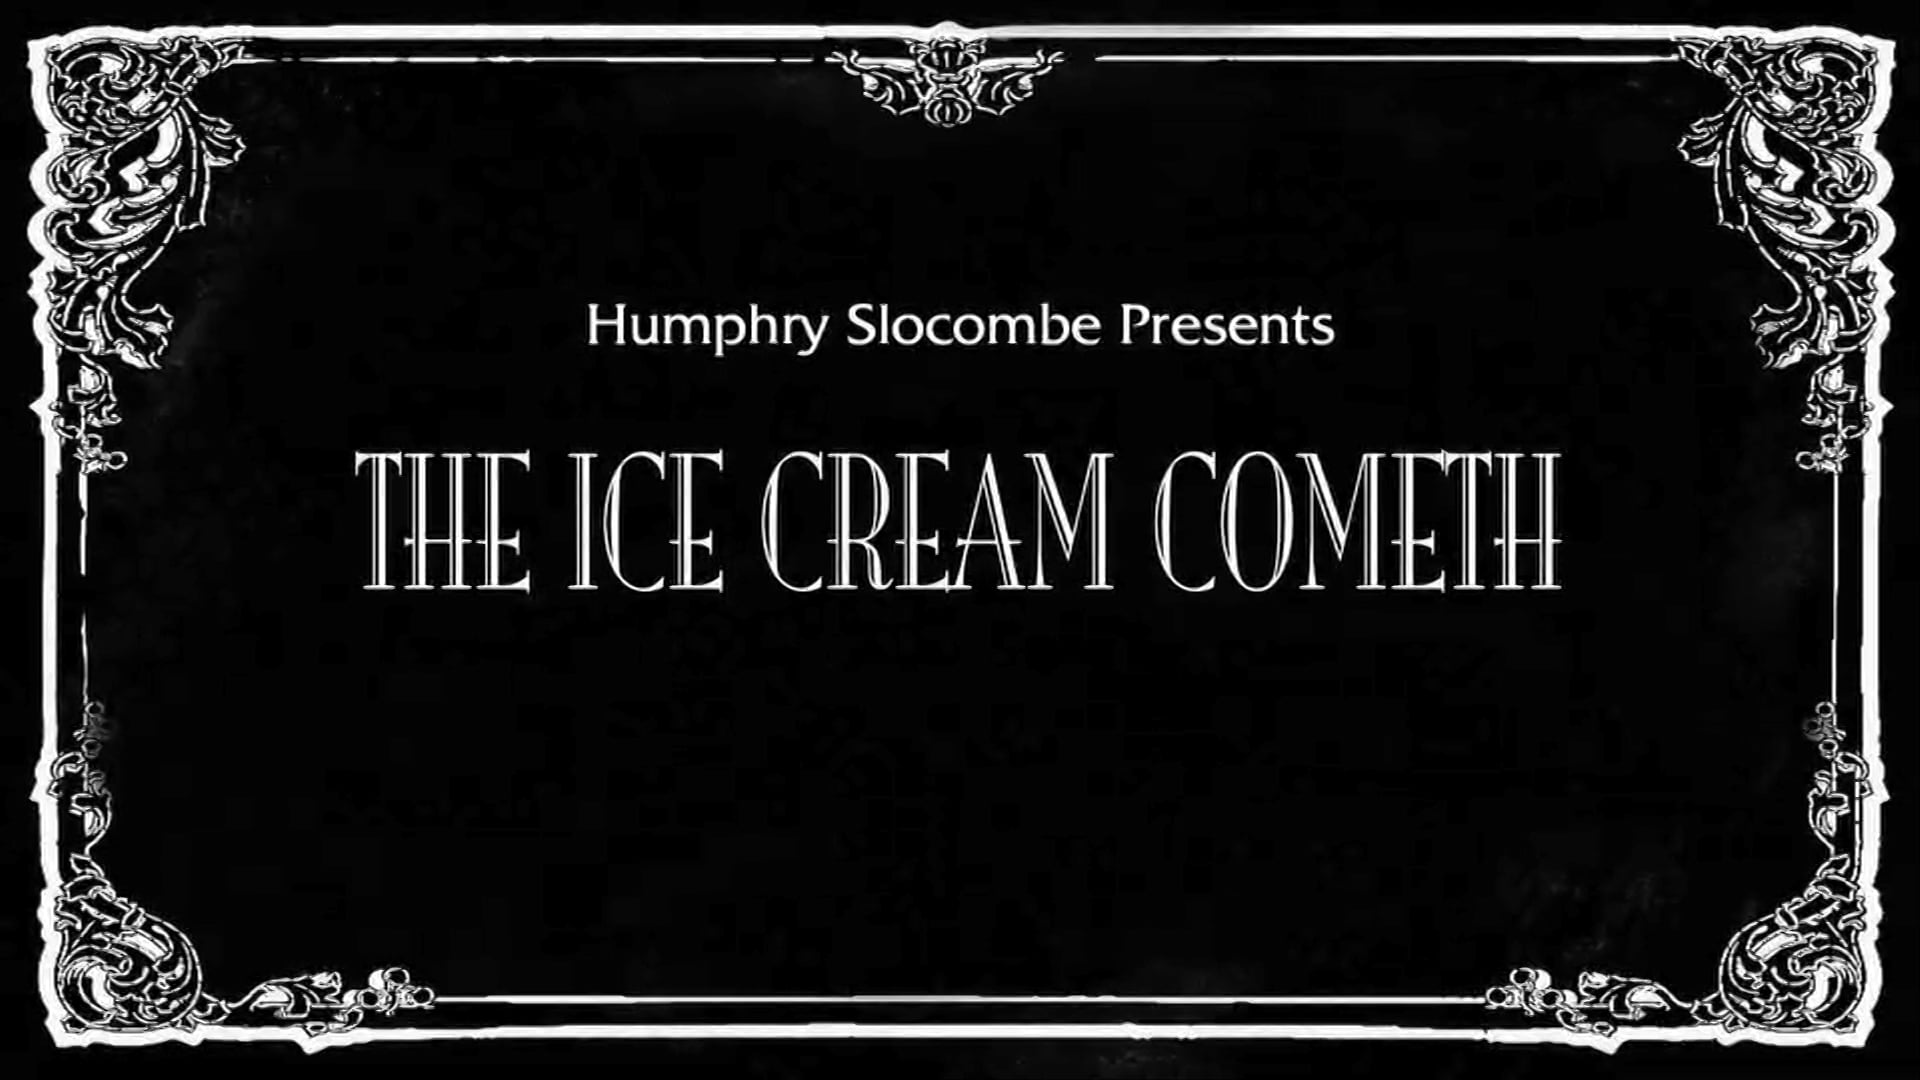 Humphry Slocombe Ice Cream / Virgin America Partnership